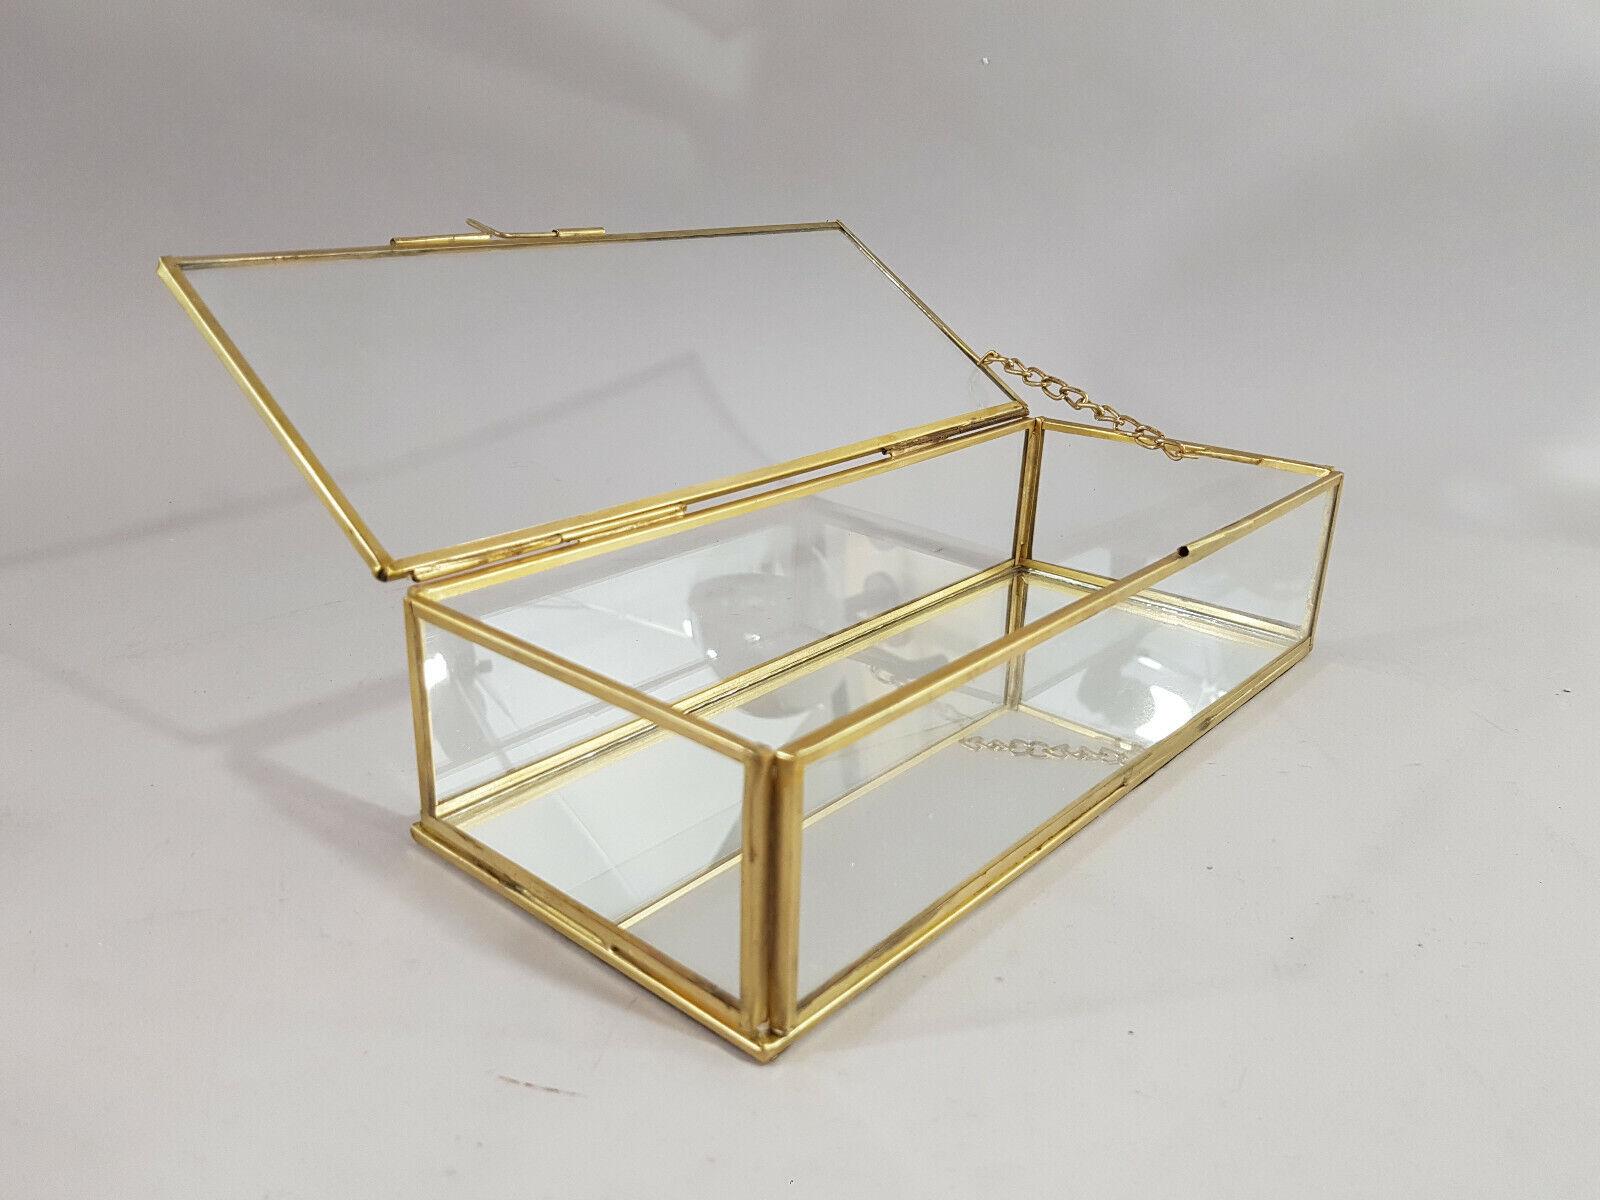 Schmuckkasten Vitrine Glas Metall Gold Messing Glasdose Glaskasten Box H